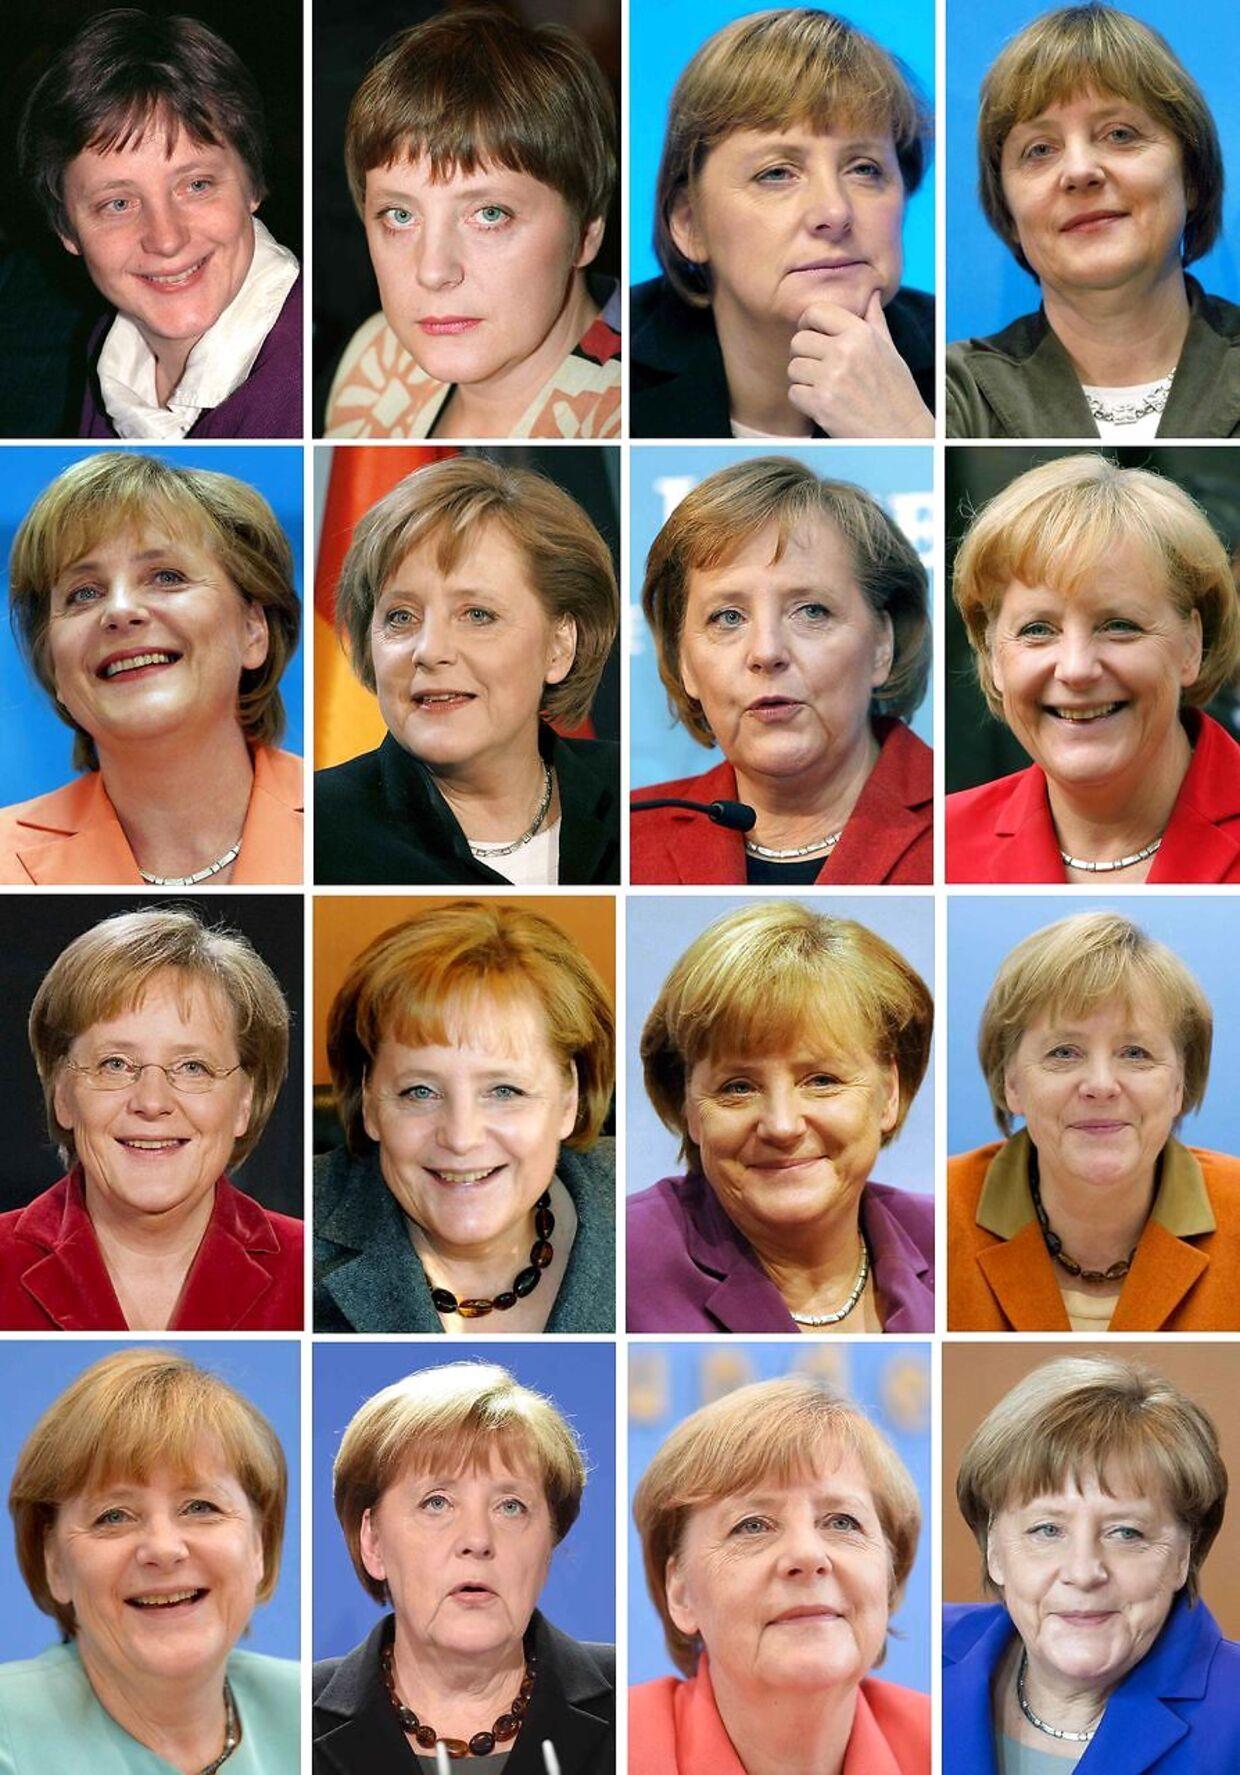 16 år i Europas historie. Merkel siger farvel